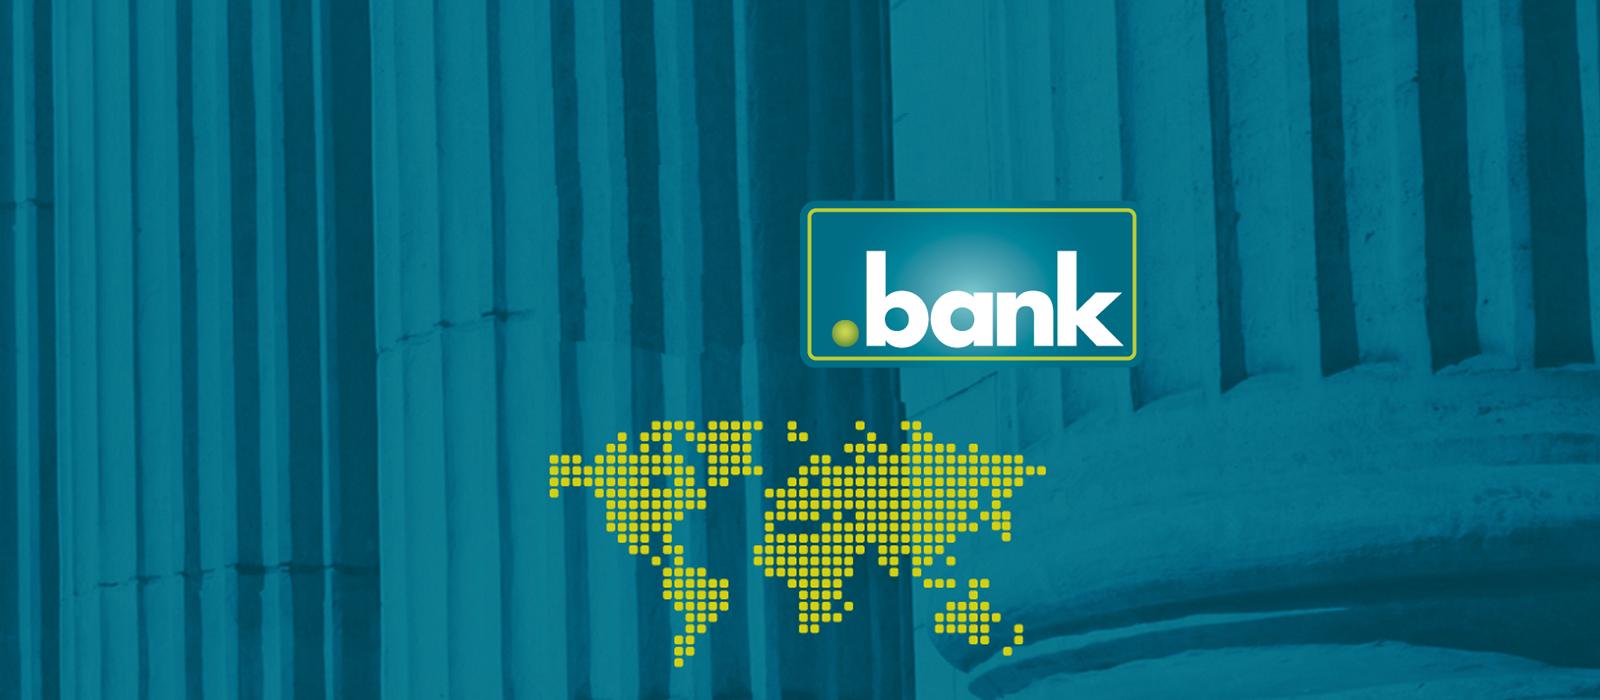 dot-bank-release-slider2